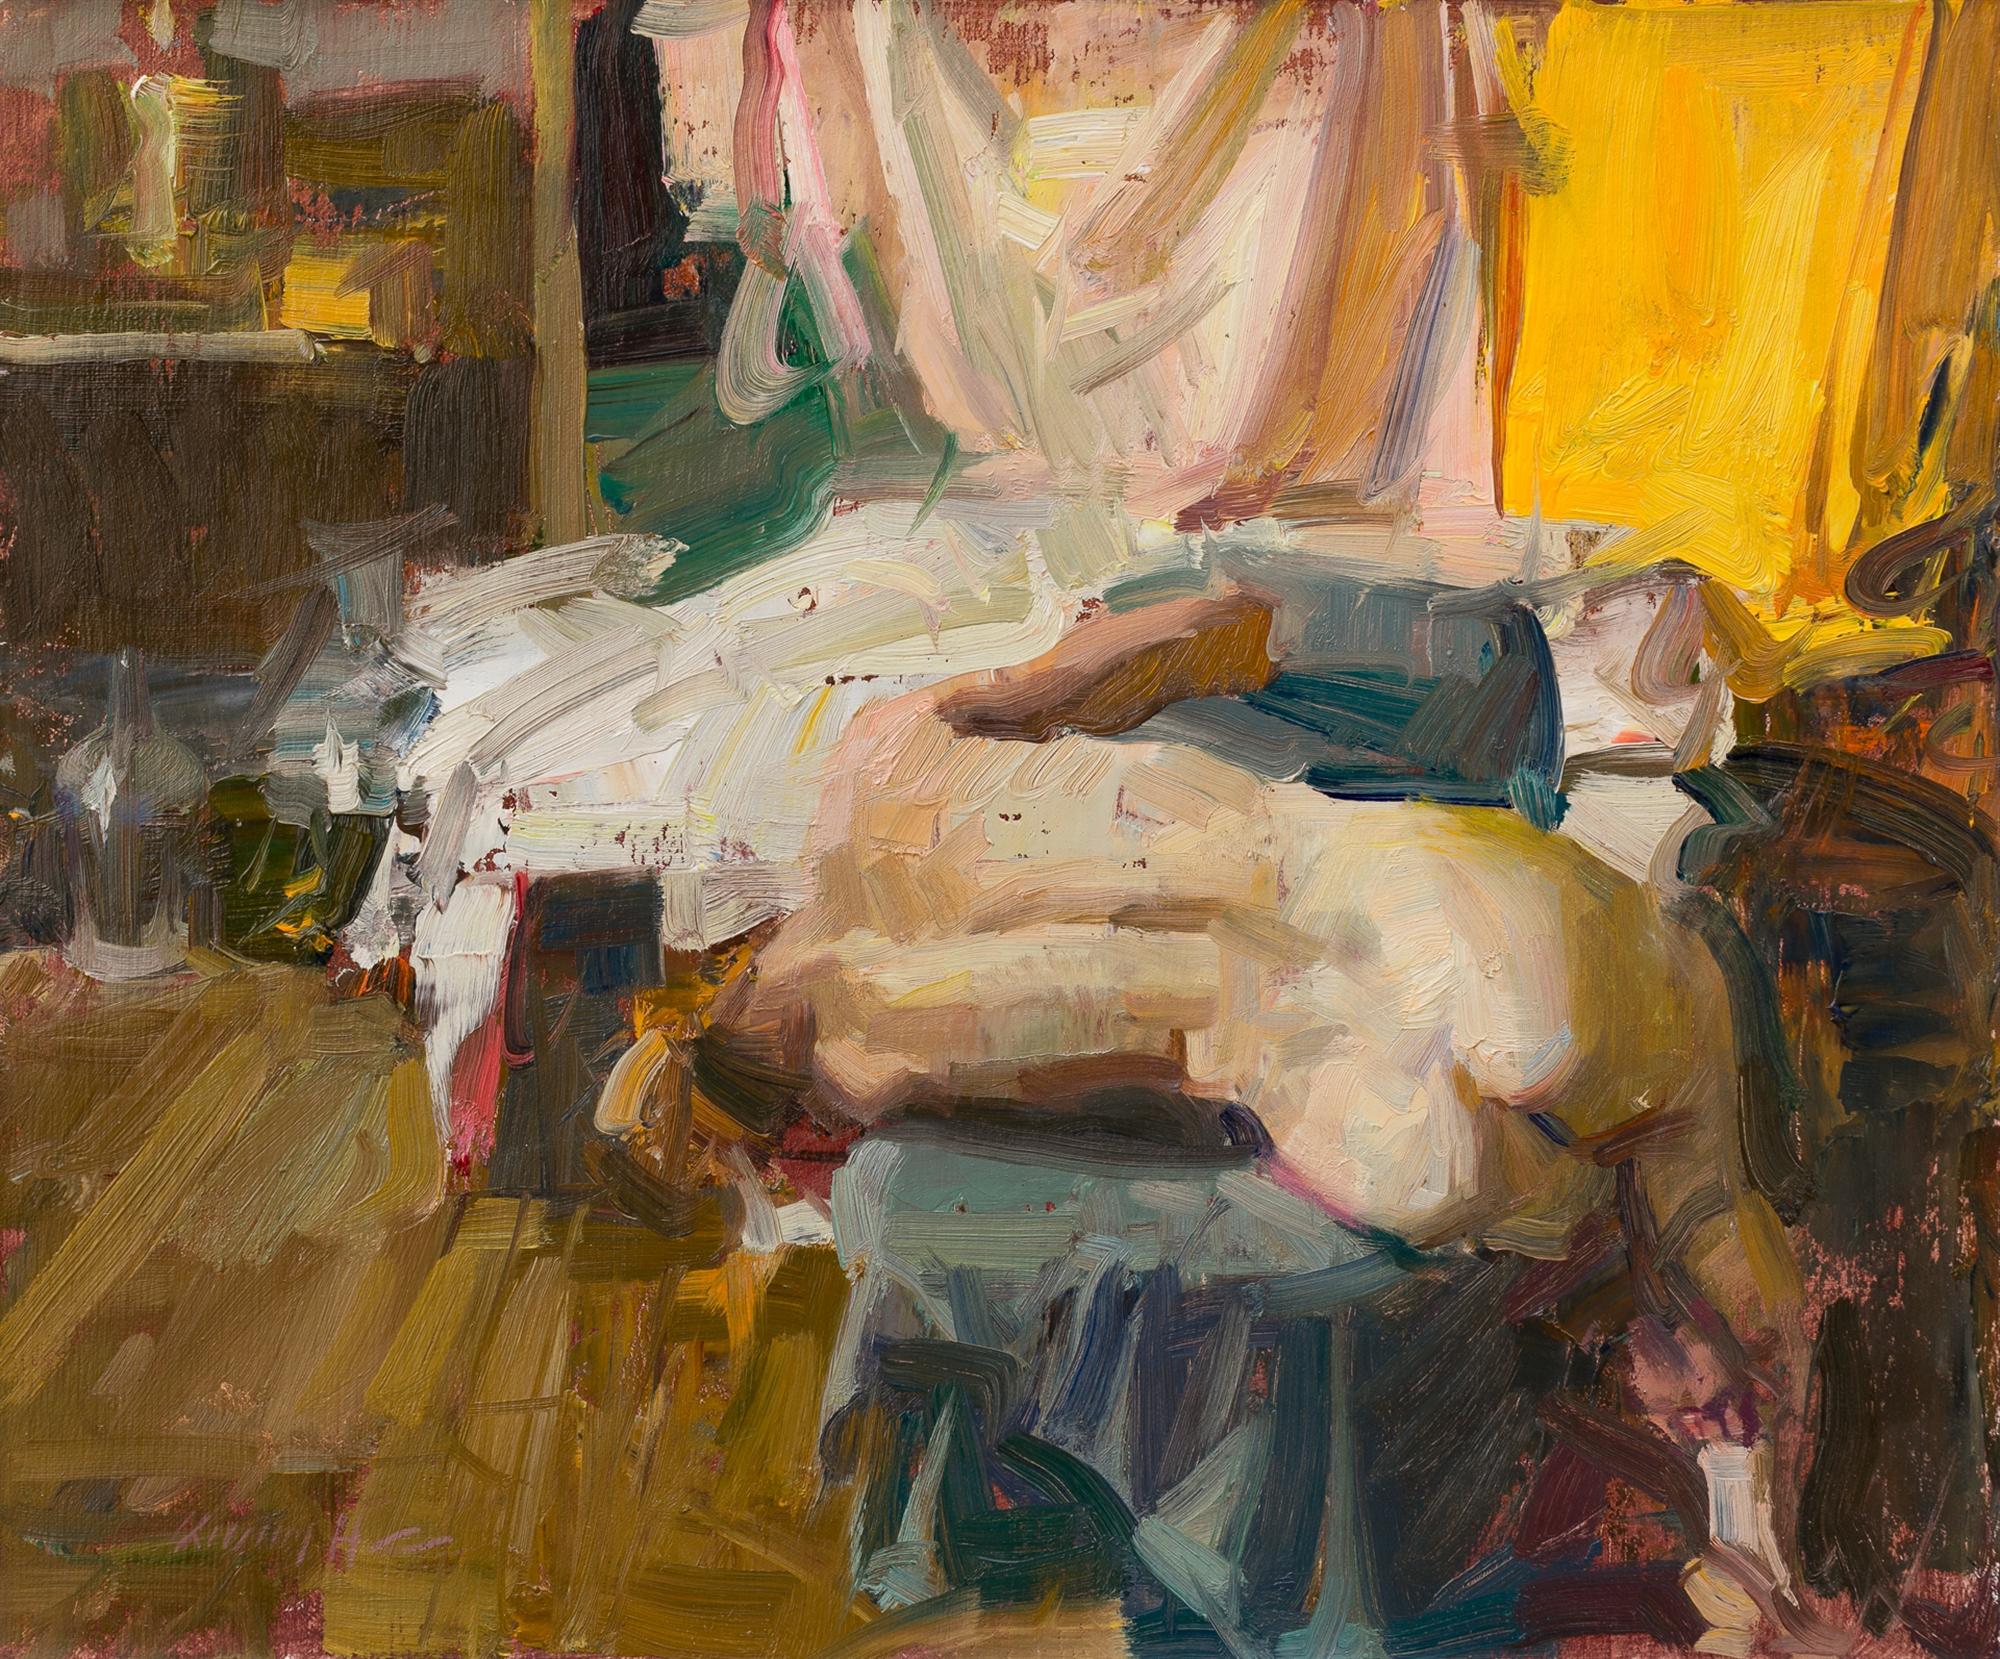 Sideways - Figure in Studio by Quang Ho